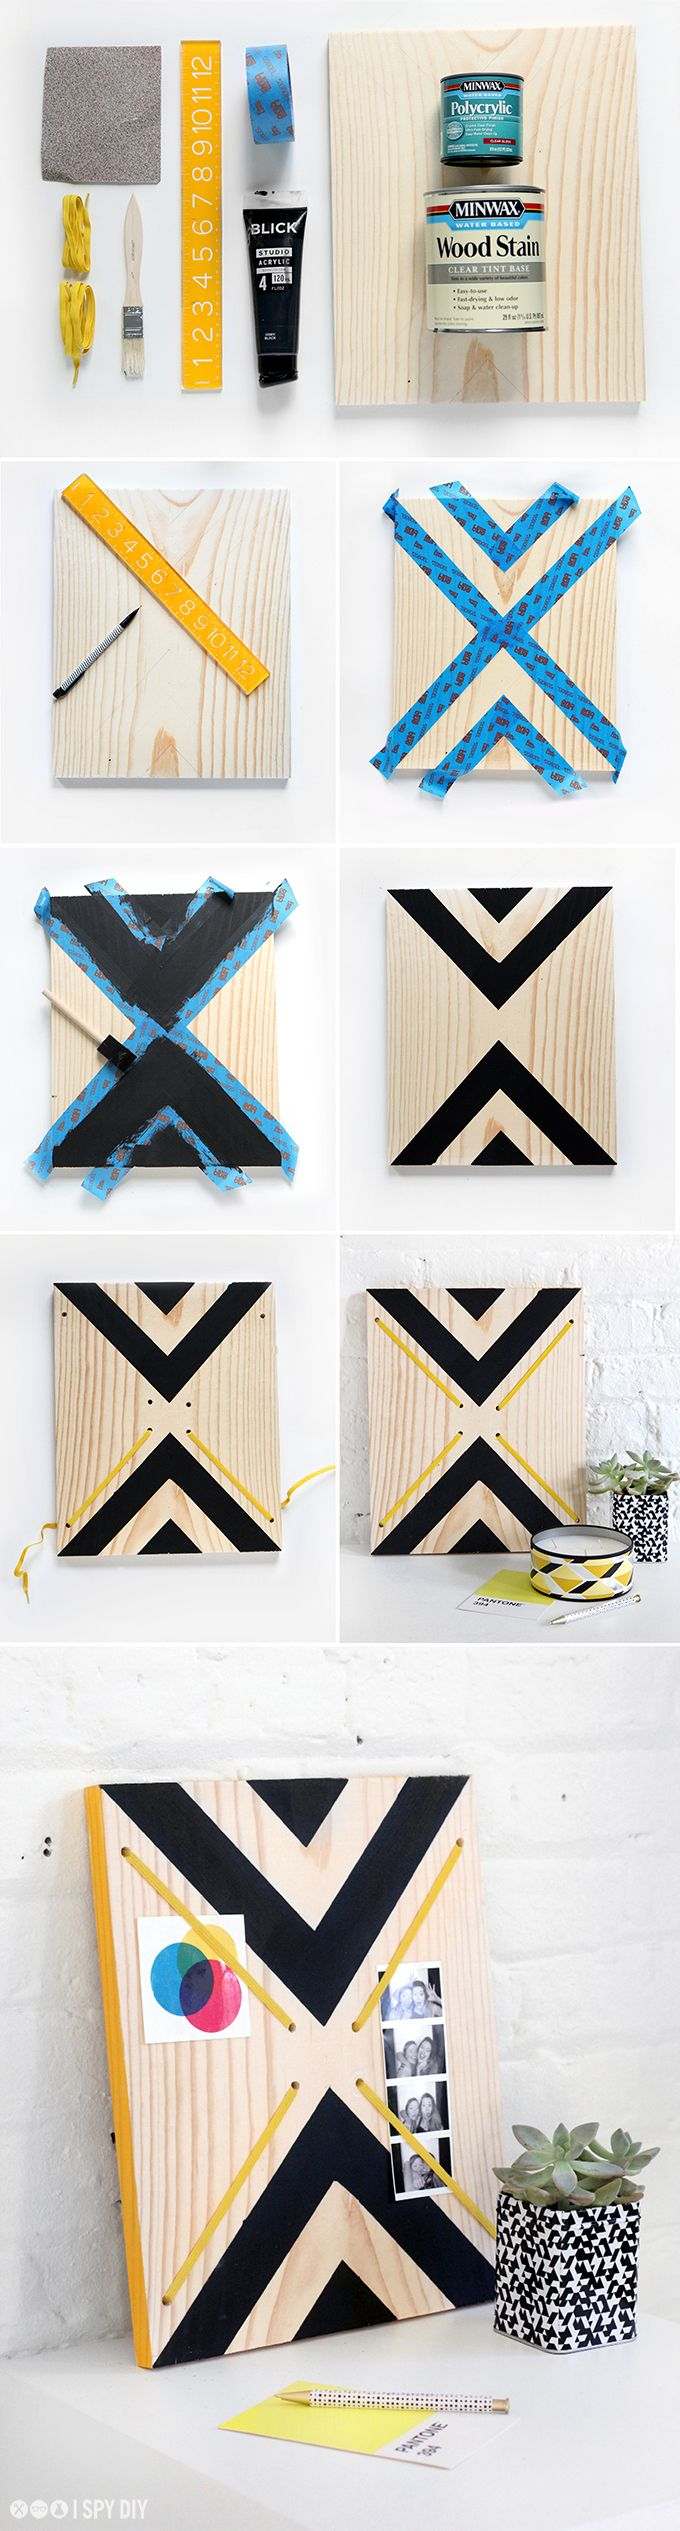 Wood slab coffee table with jenni of i spy diy minwax blog - My Diy Graphic Print Memo Board I Spy Diy